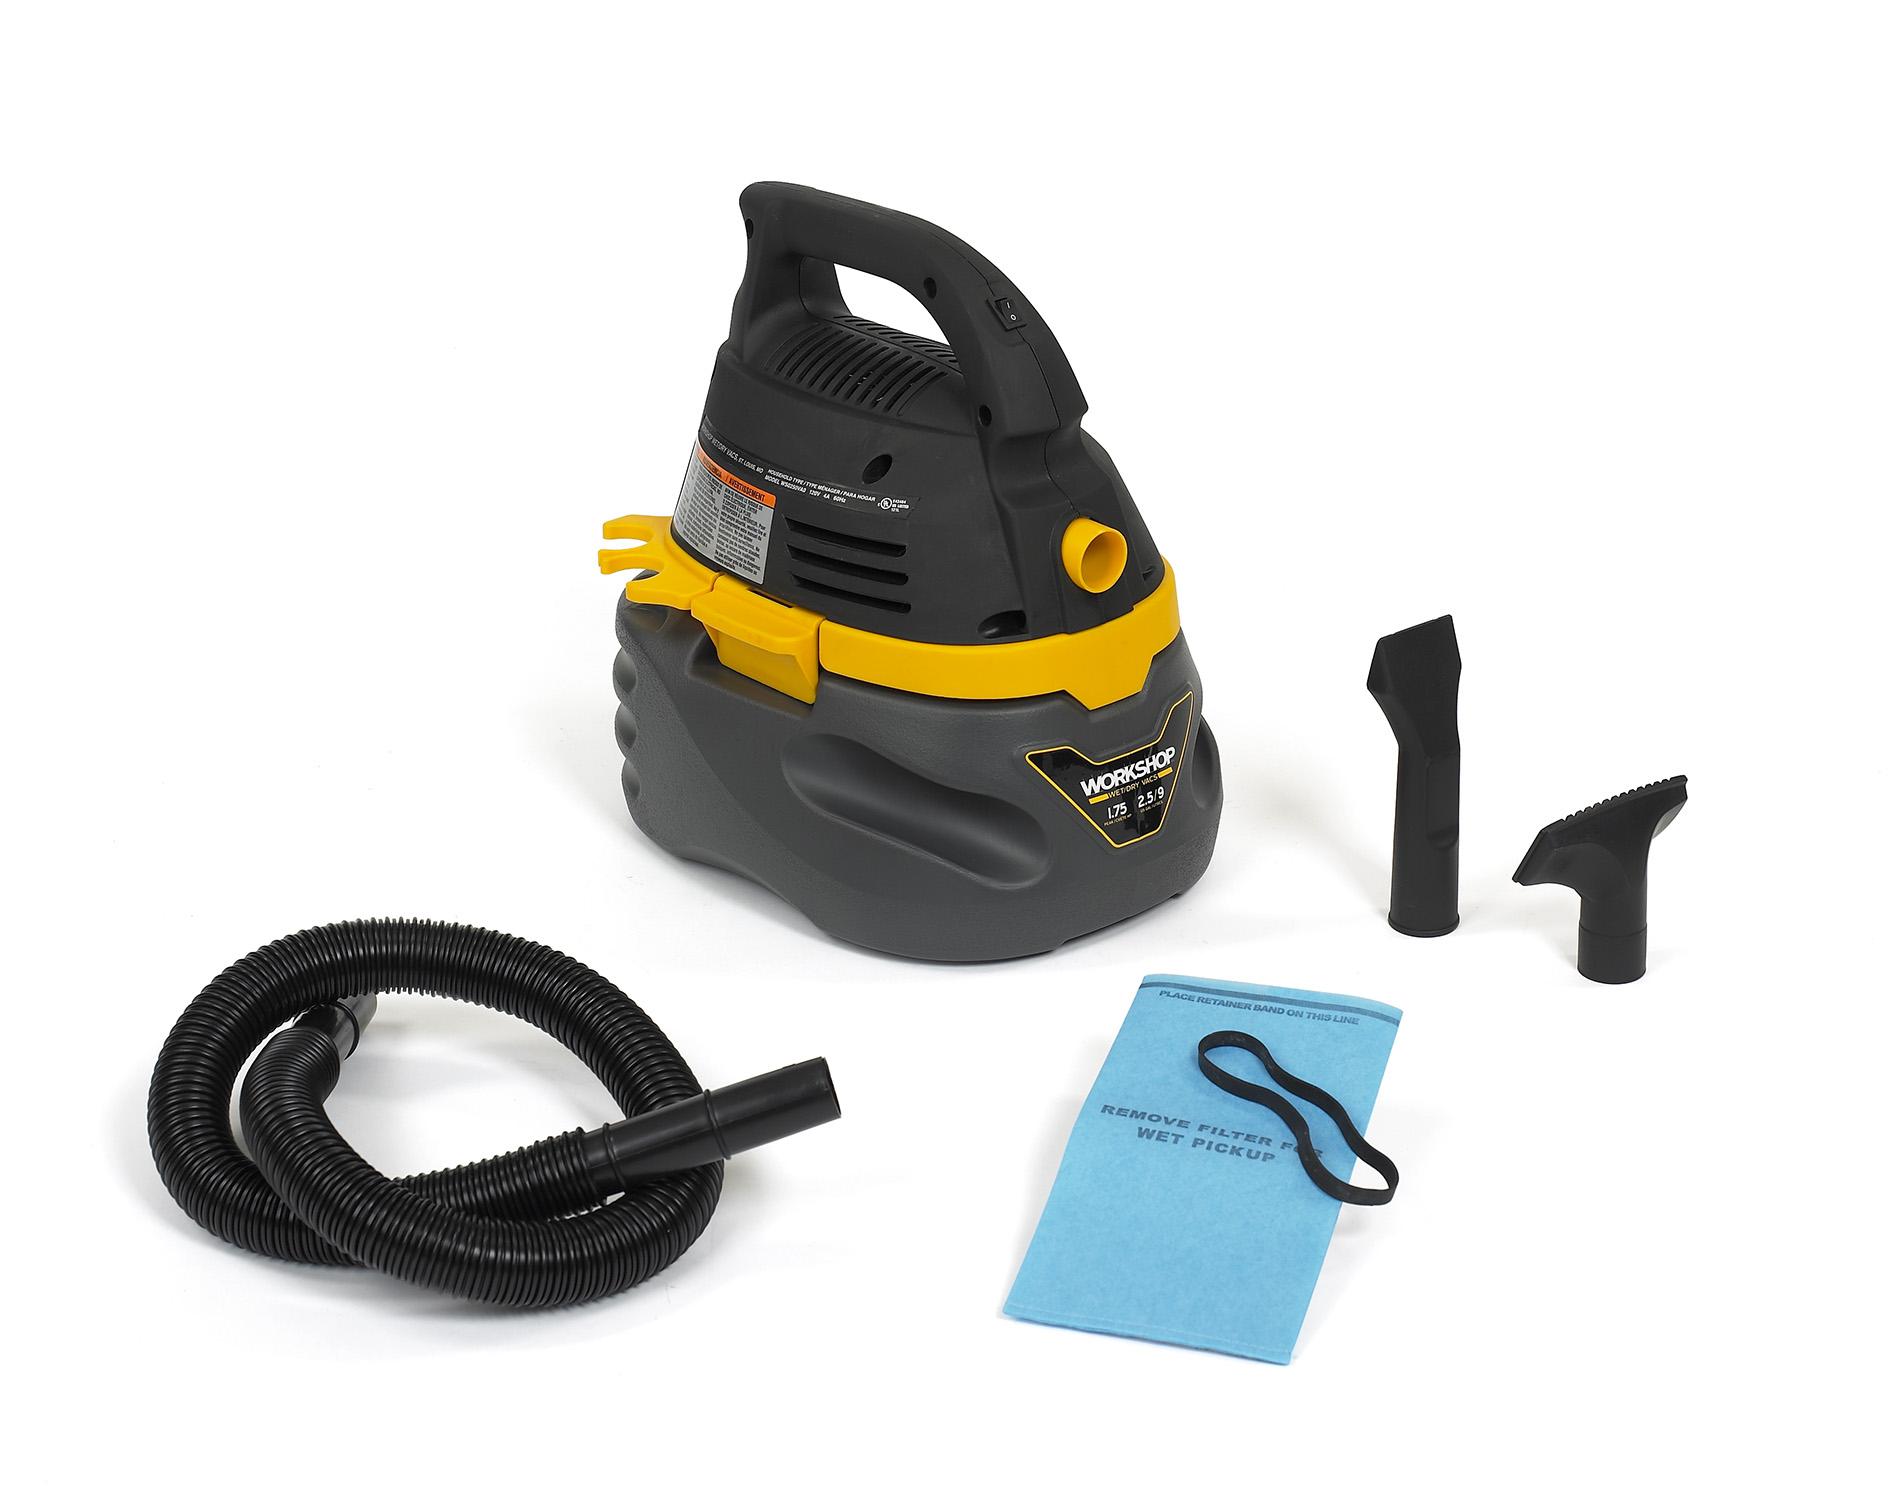 WORKSHOP Wet Dry Vacs WS0250VA Portable 25 Gallon 175 Peak HP Vacuum Cleaner